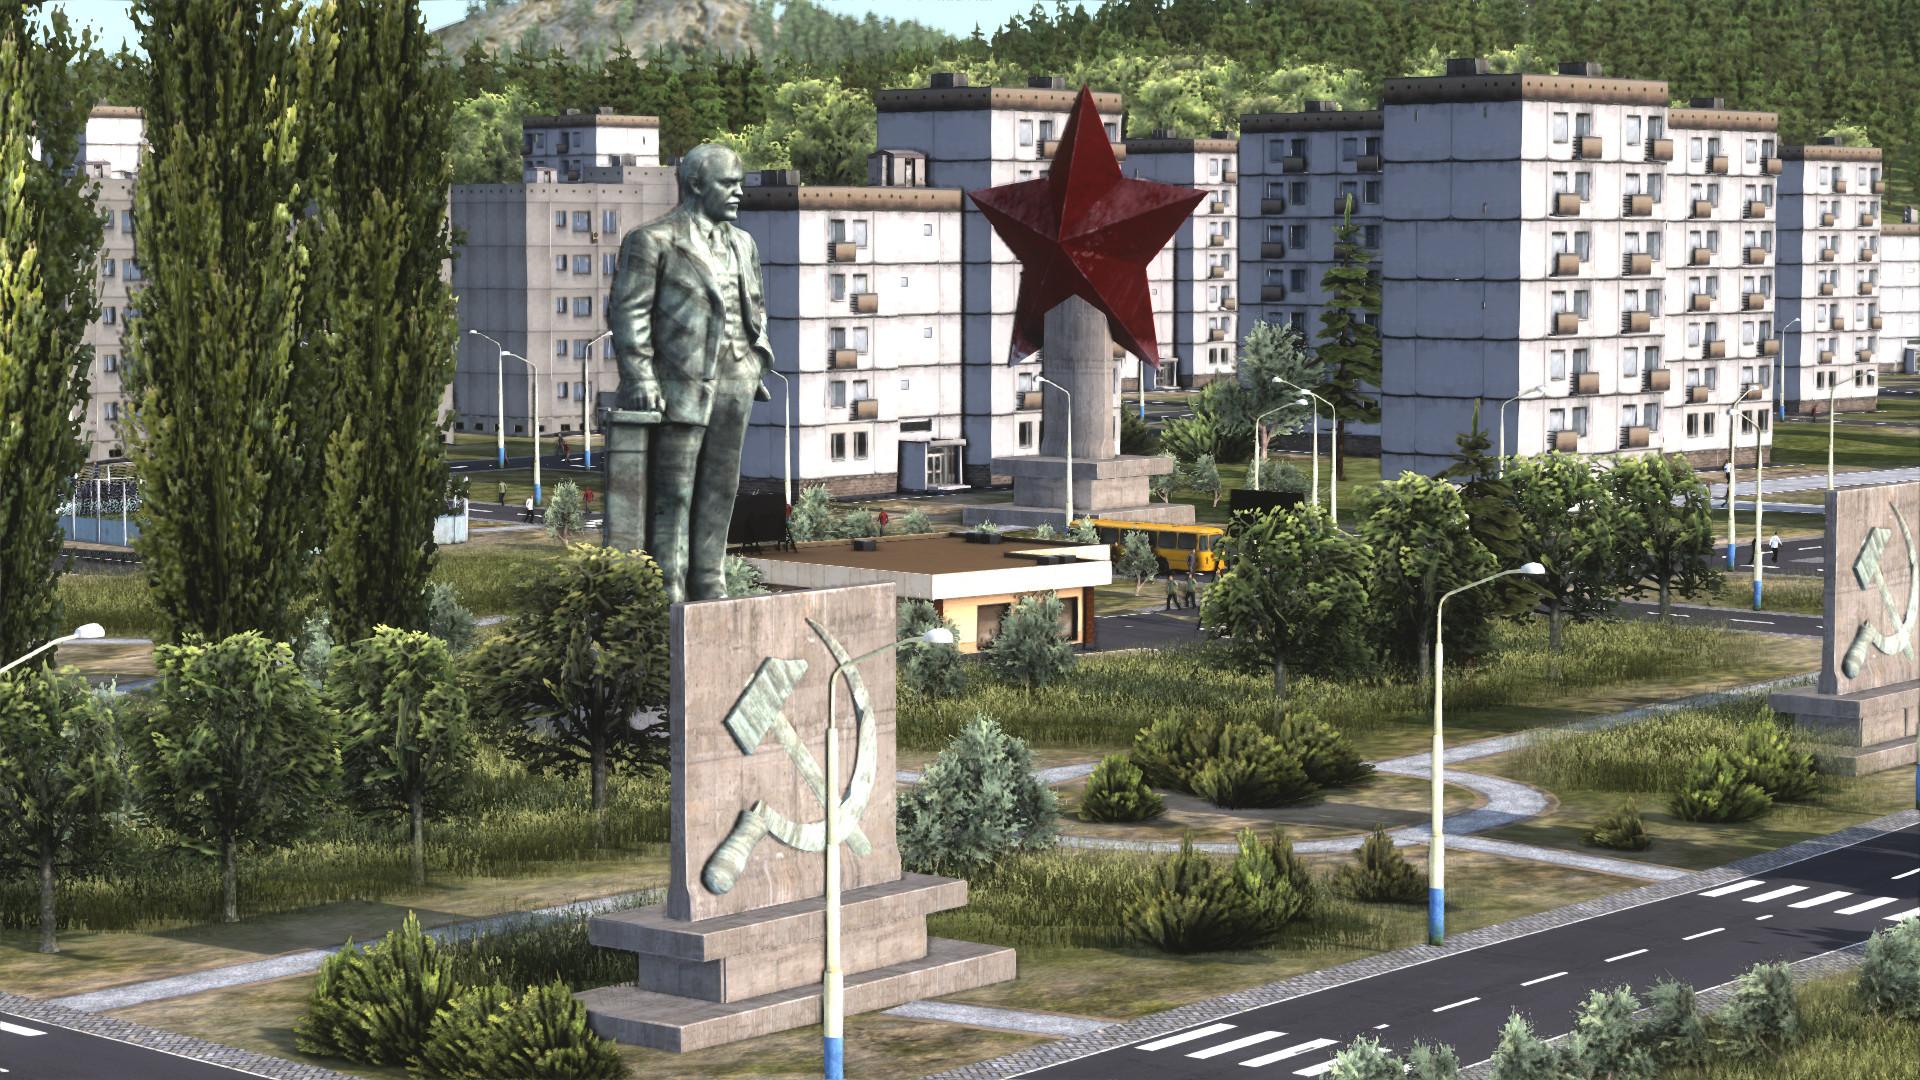 workers & resources soviet republic download igg games